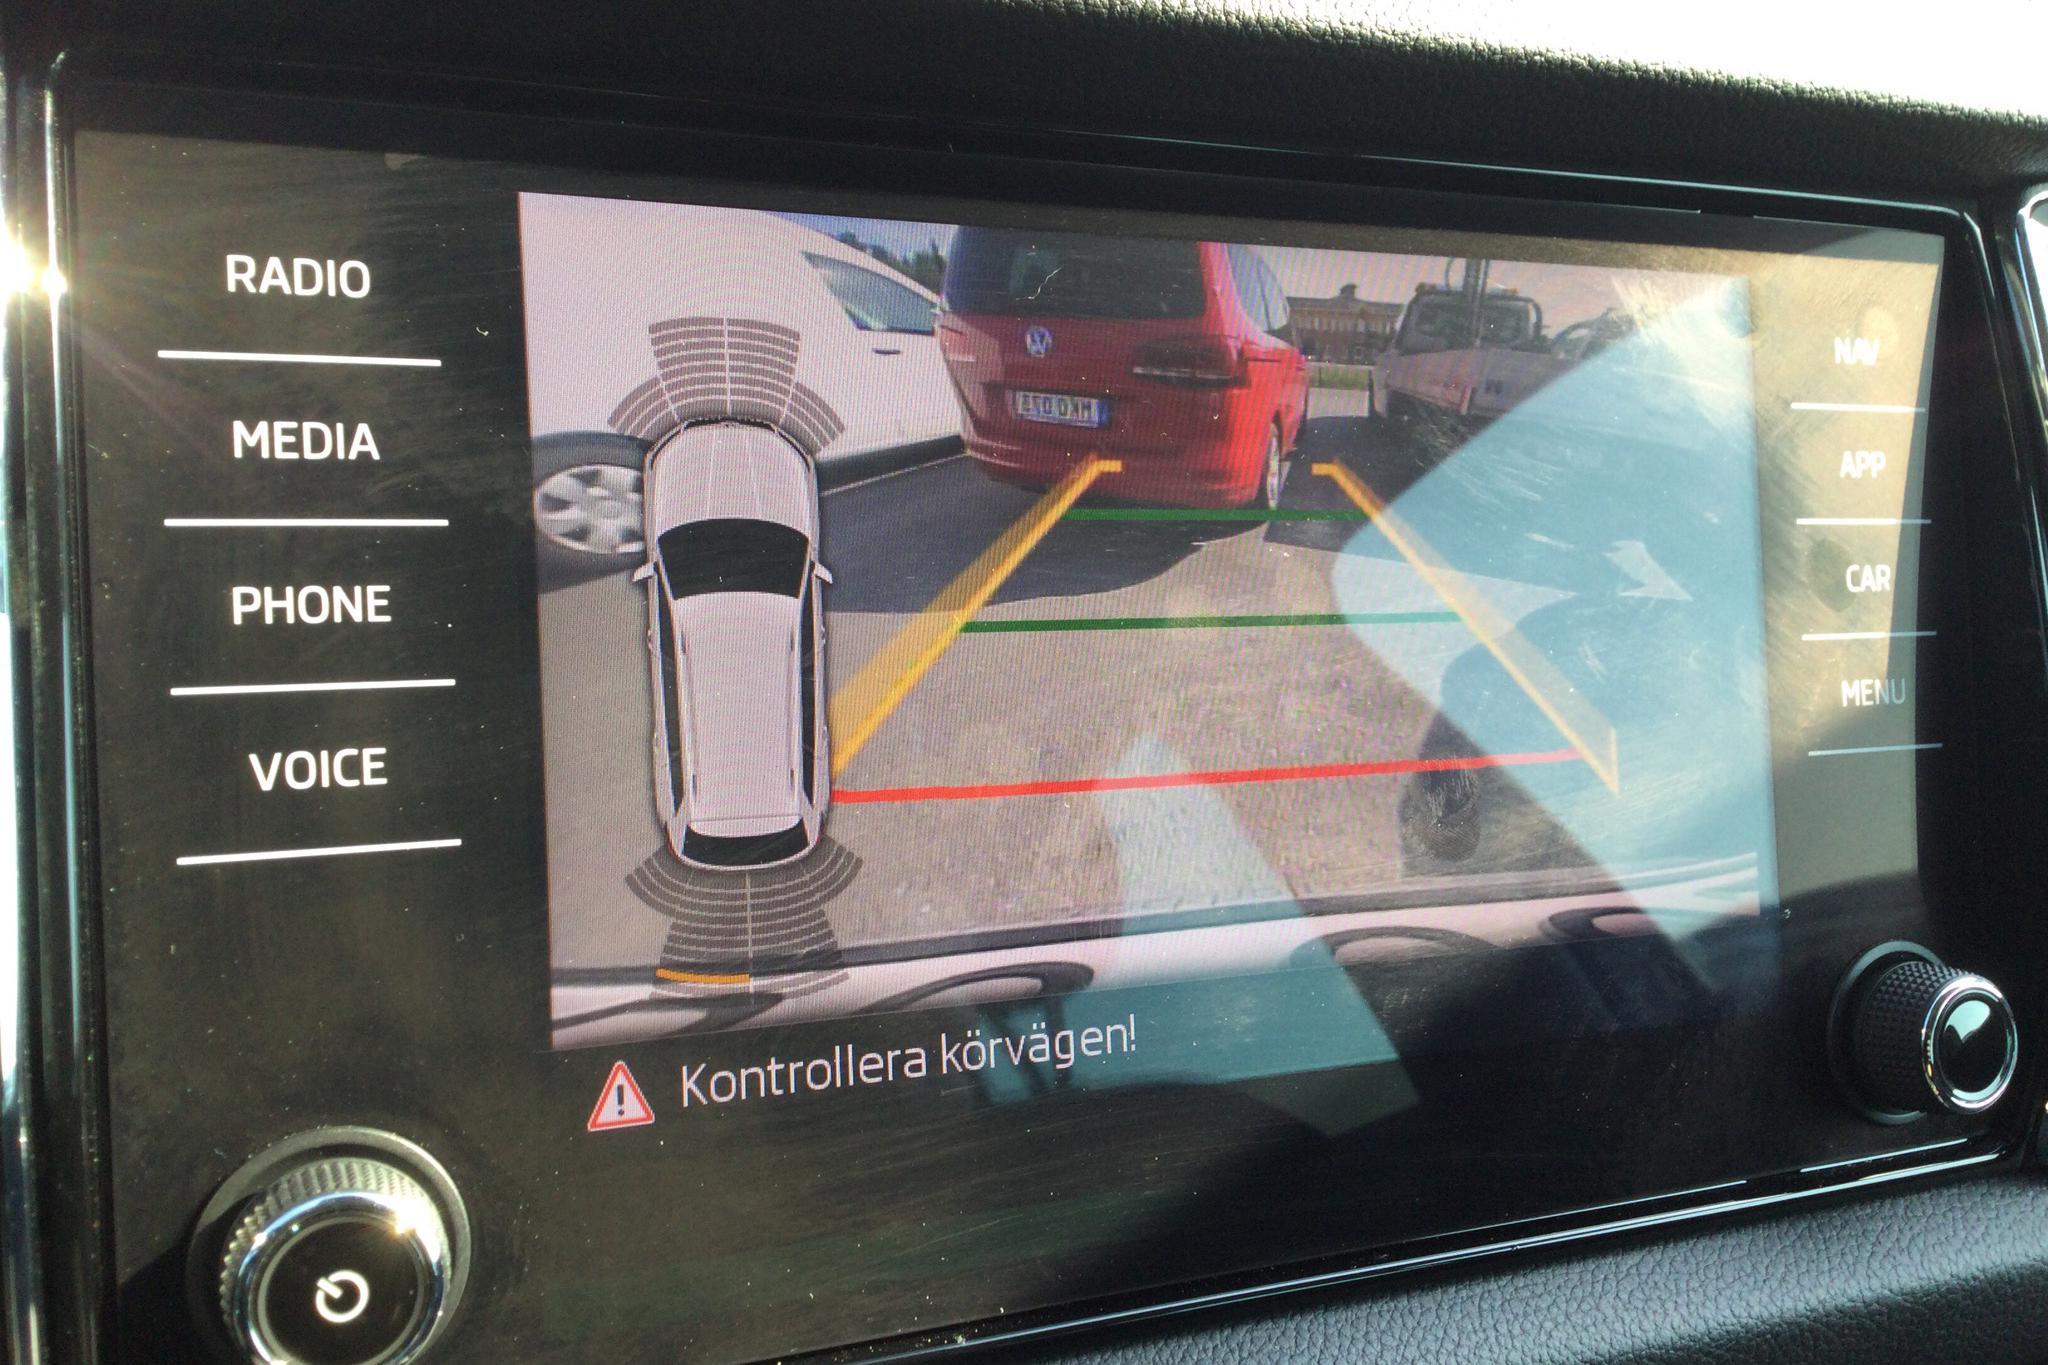 Skoda Kodiaq 2.0 TDI 4X4 (190hk) - 94 350 km - Automatic - white - 2018